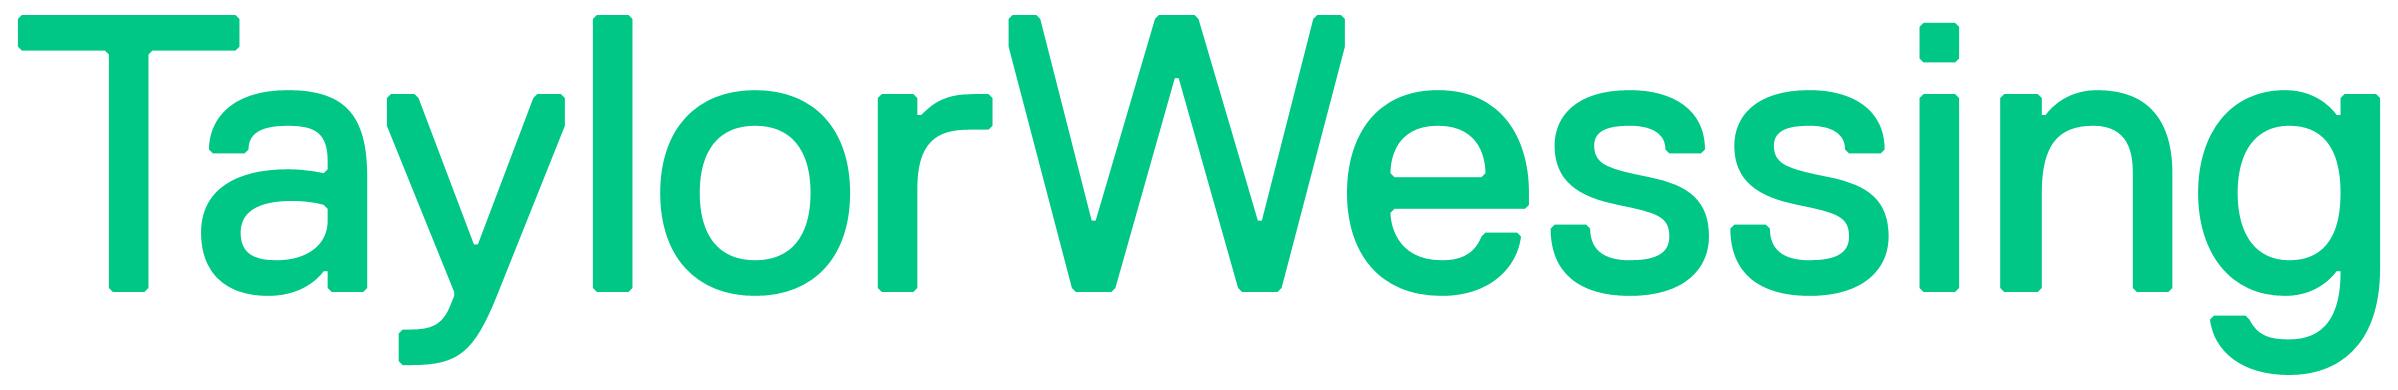 TaylorWessing e|n|w|c E. Stobiecka, logo